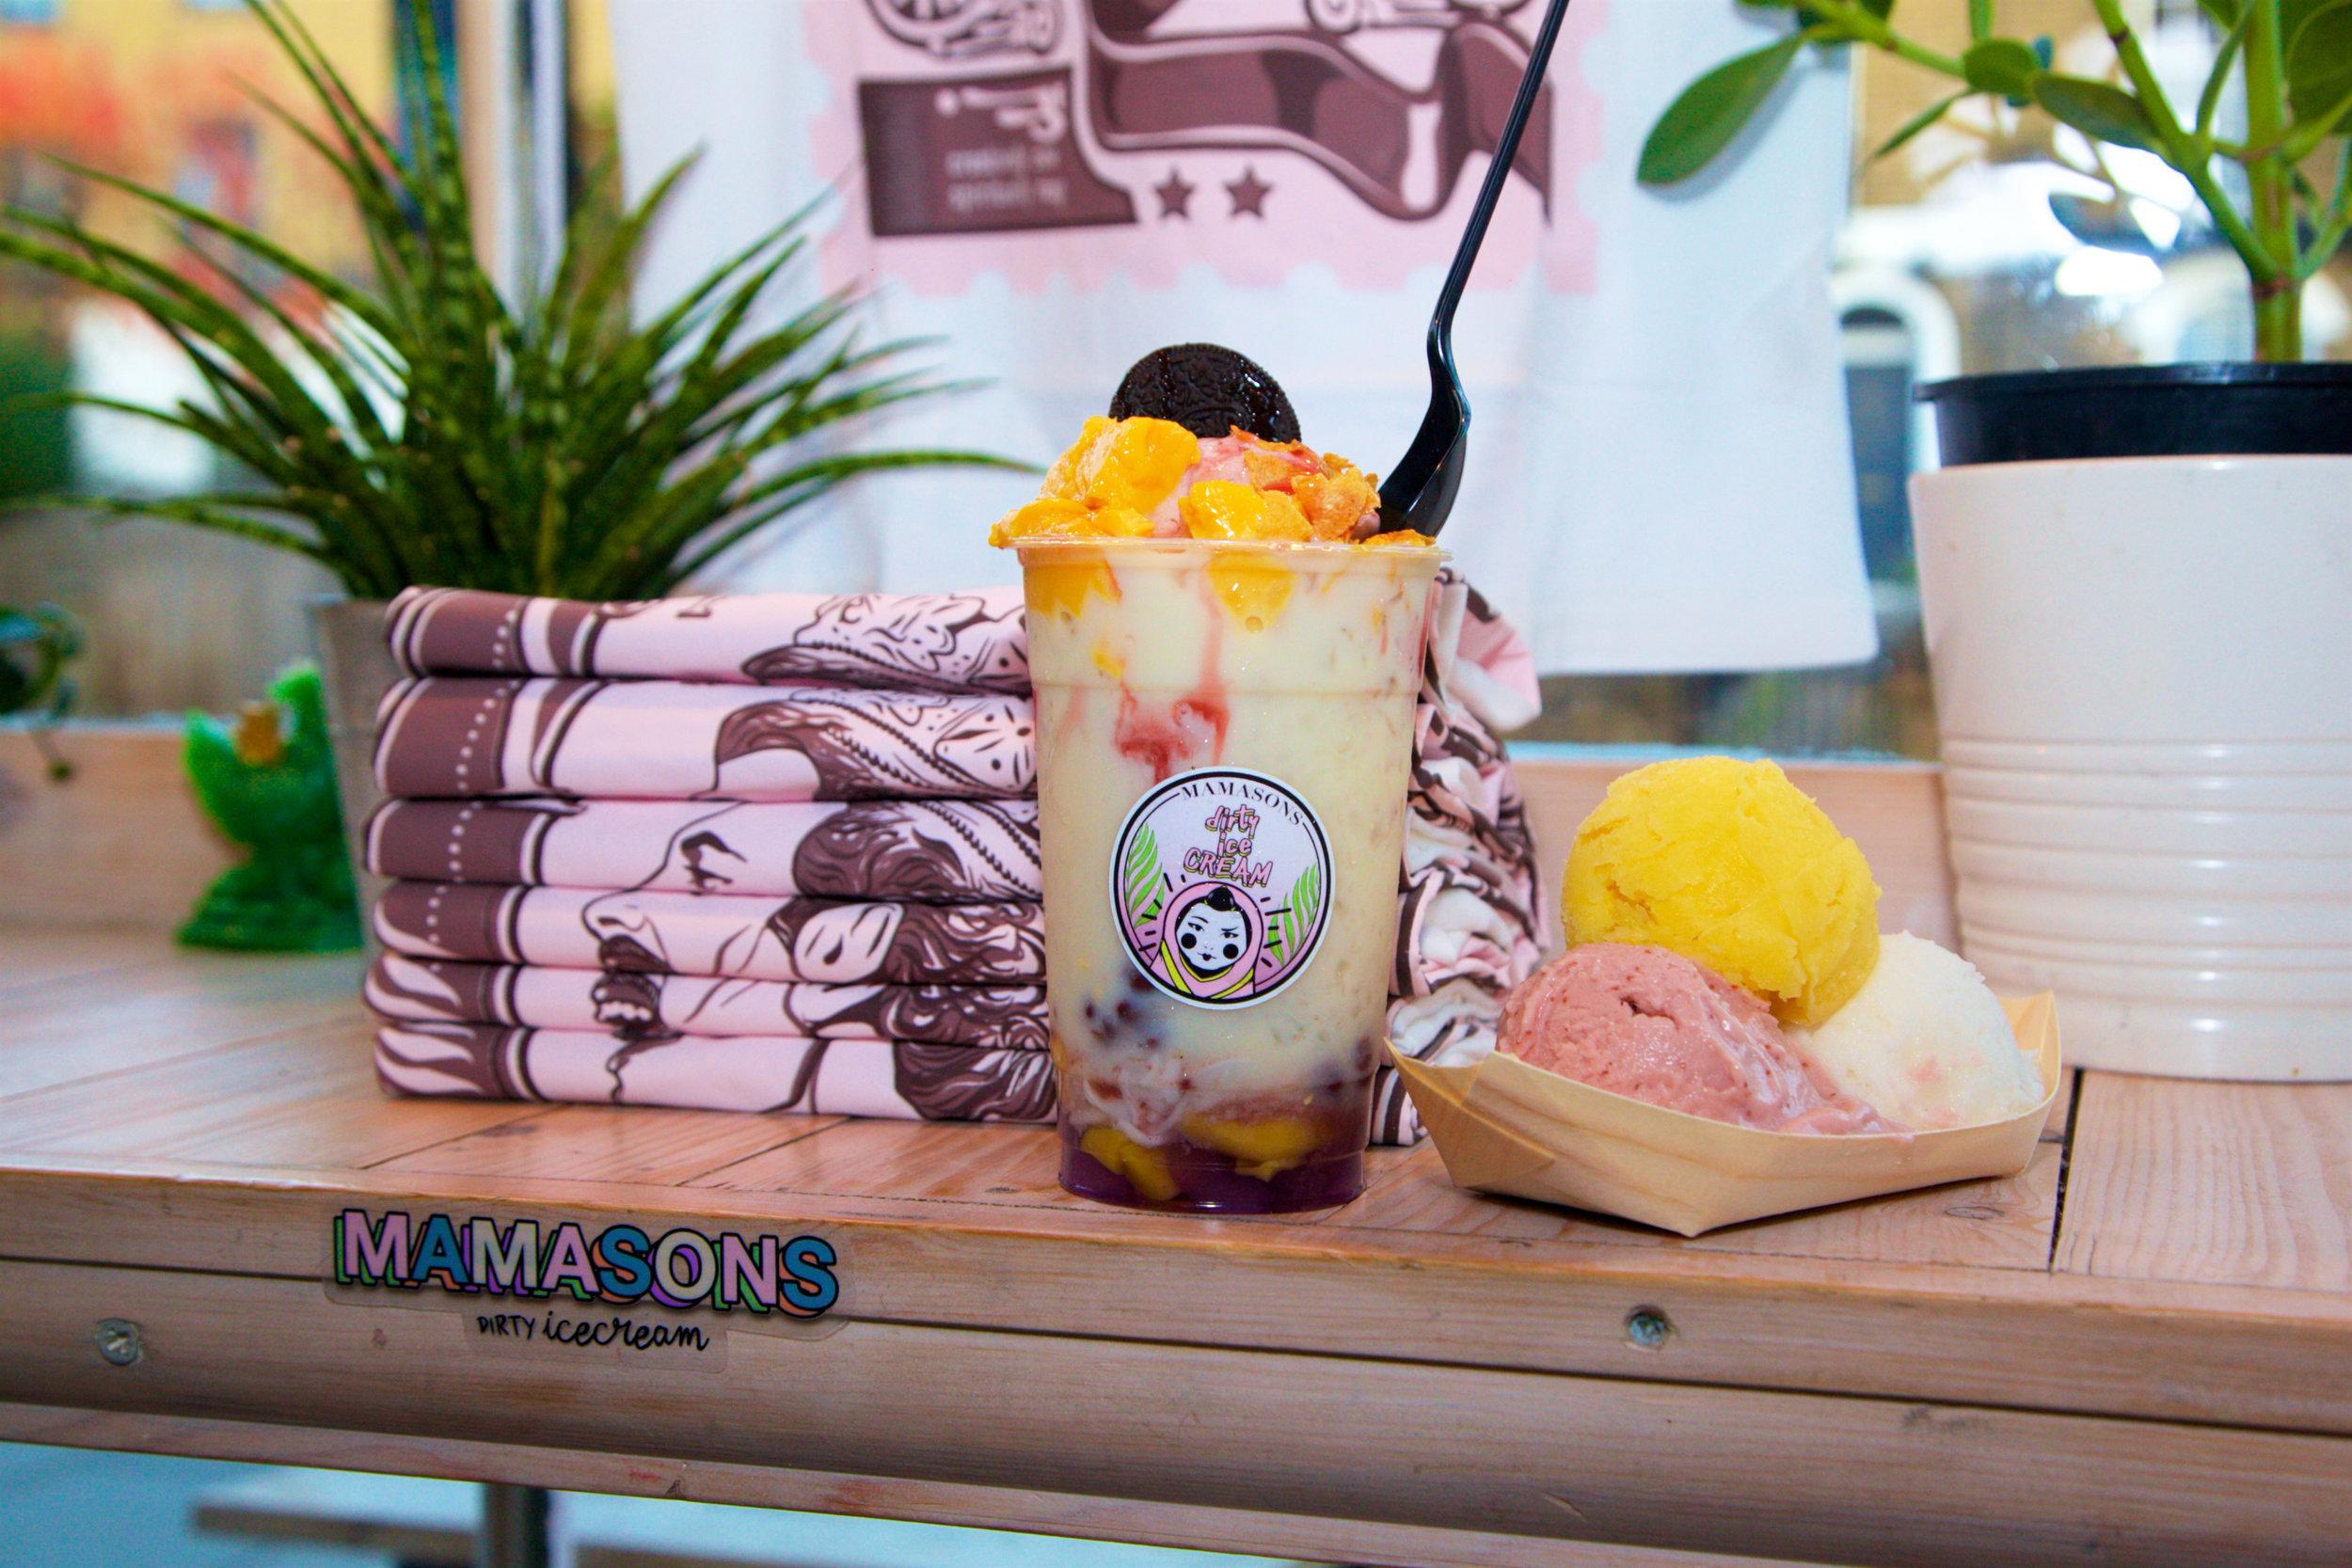 The new vegan halo halo at Mamasons—the Bohemian Raspberry!